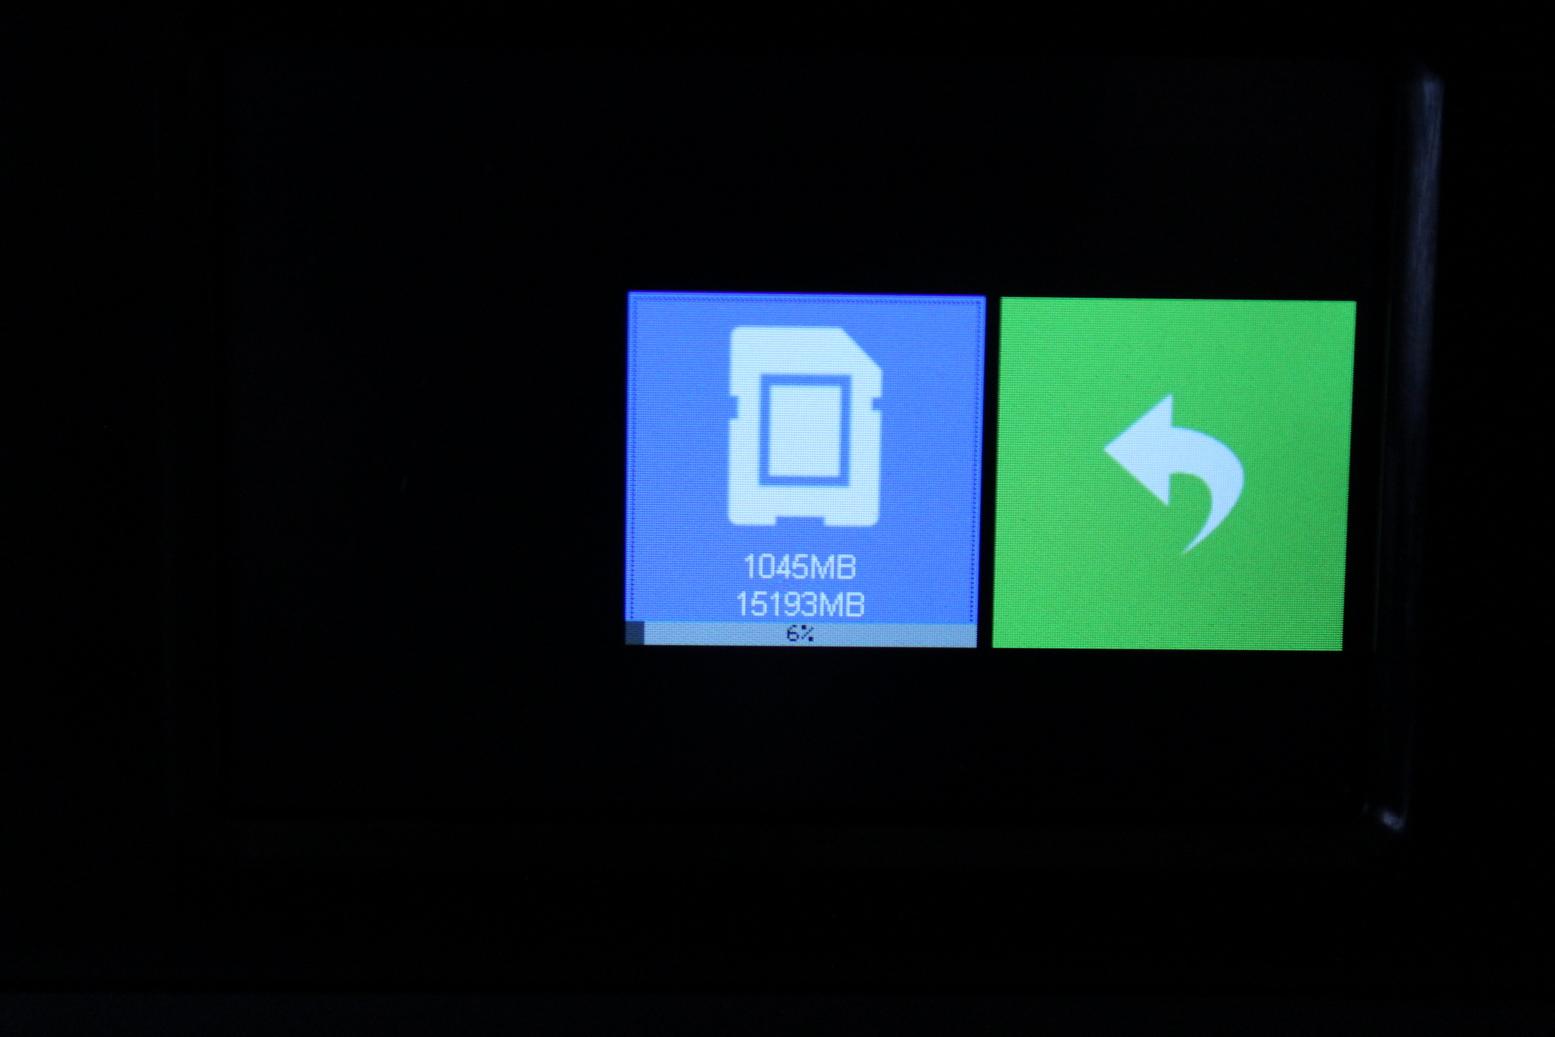 FlashForge-Creator-Pro-2-Touchscreen-Interface-10